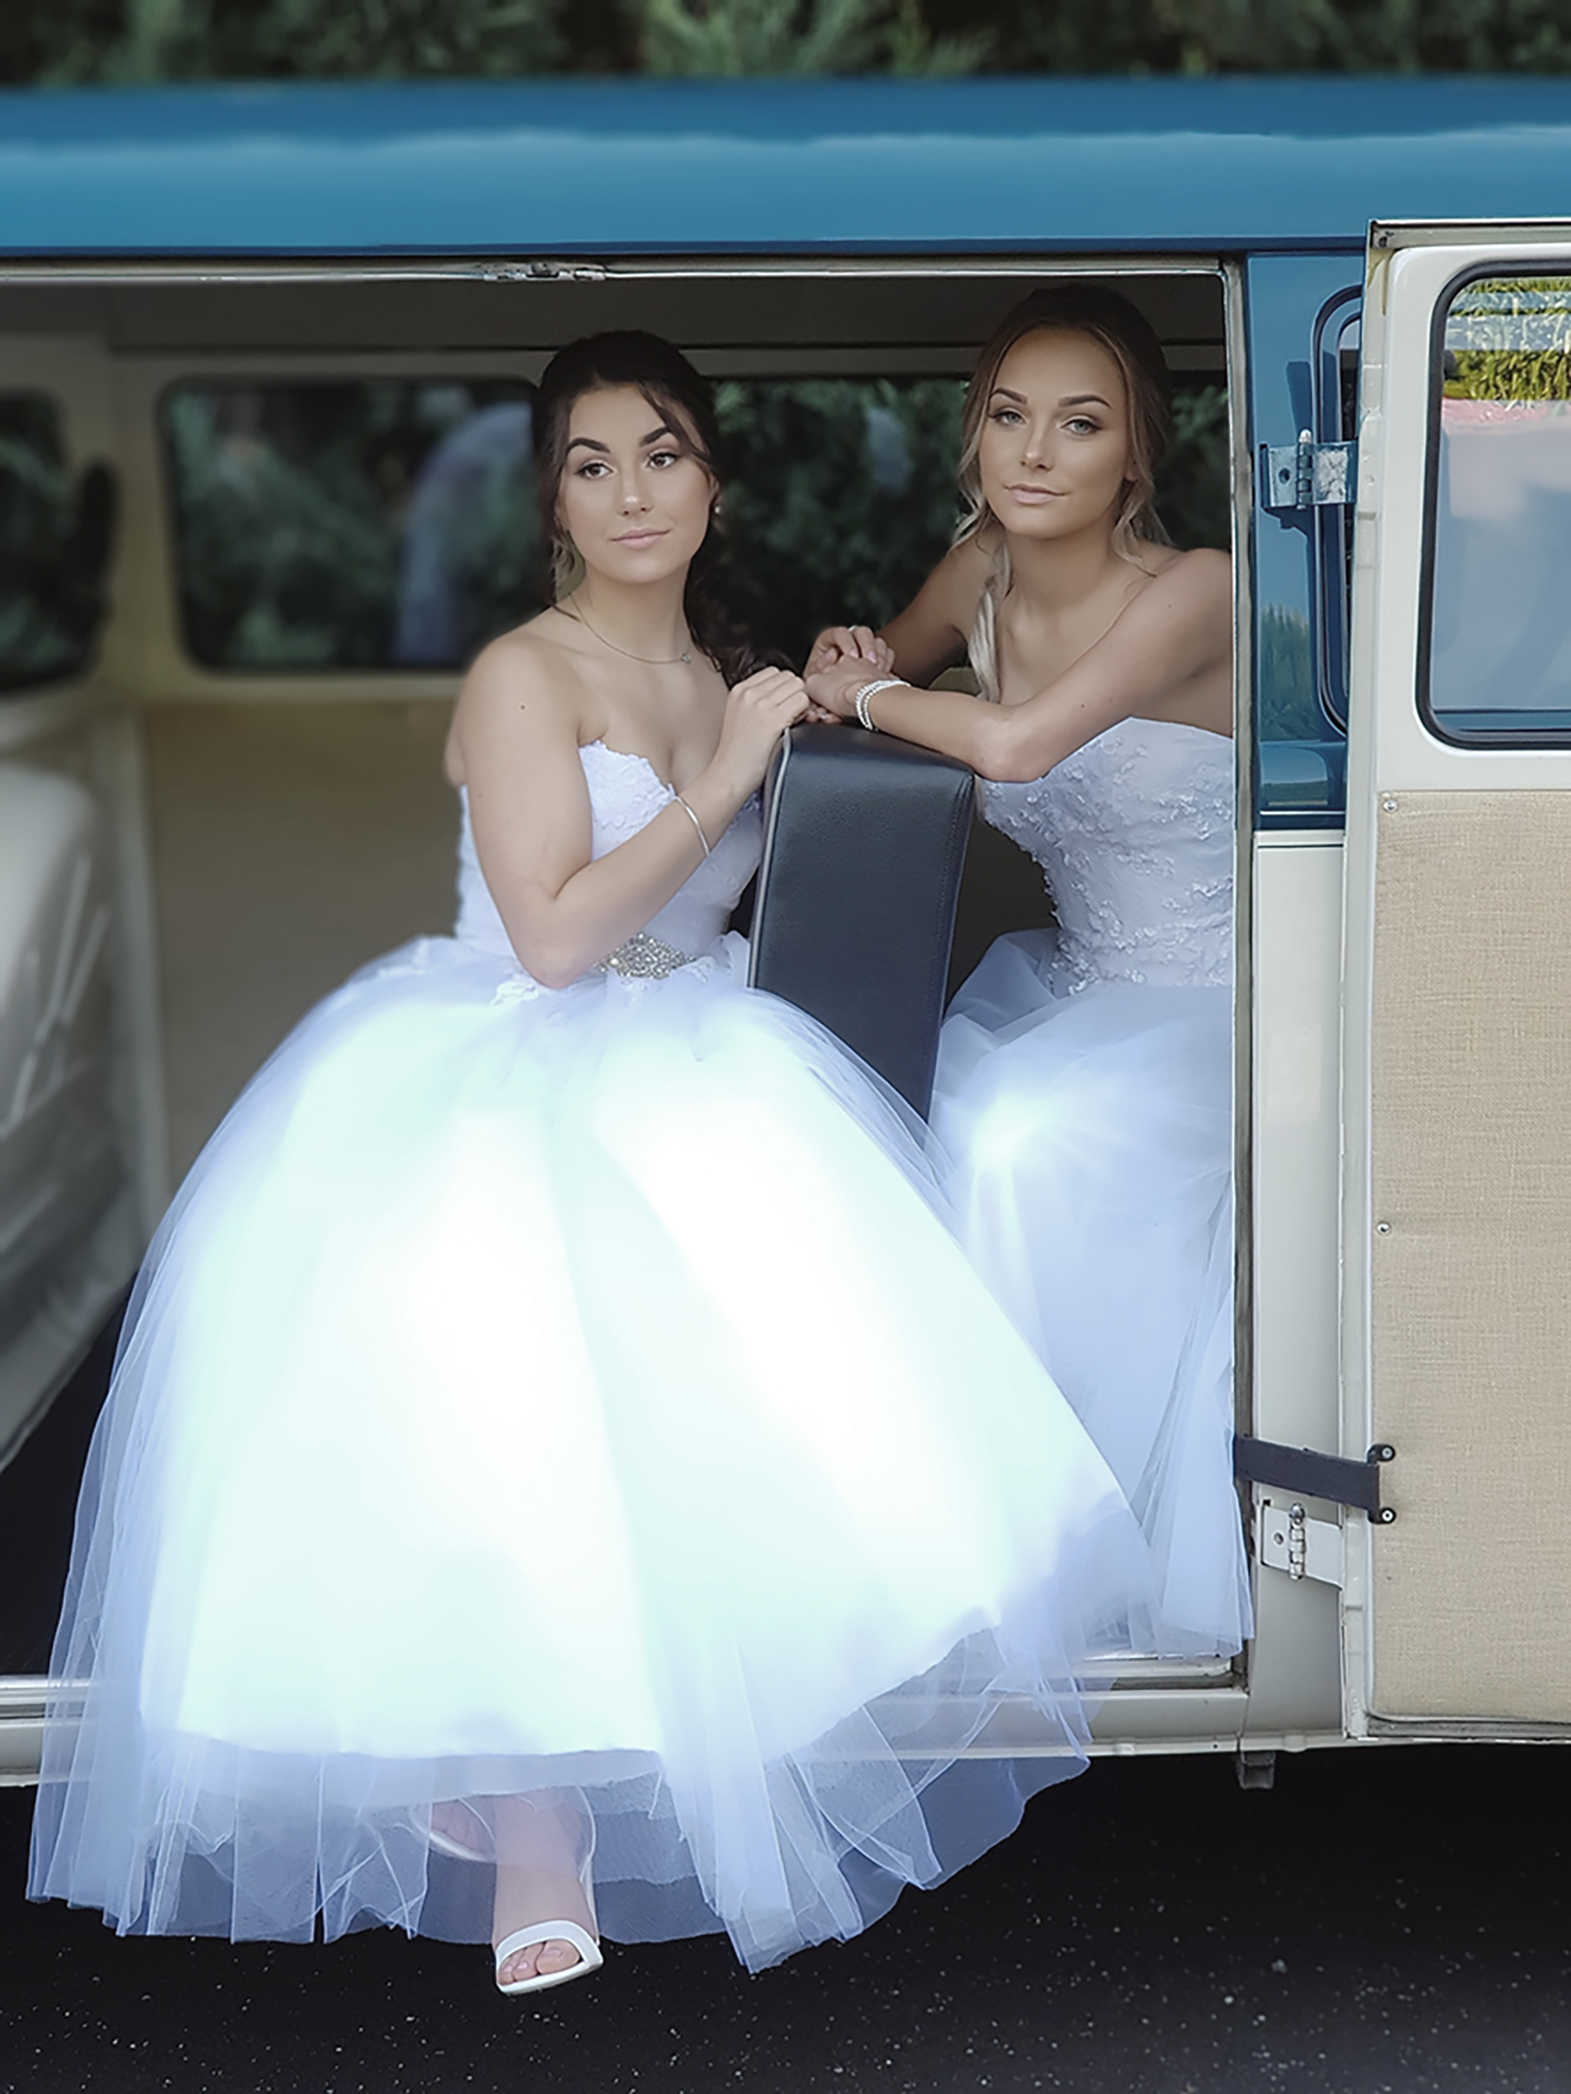 Casey Grammer Debutante Ball - Photo's by Kombi & Beetle Wedding & Debutante Car Hire (31)